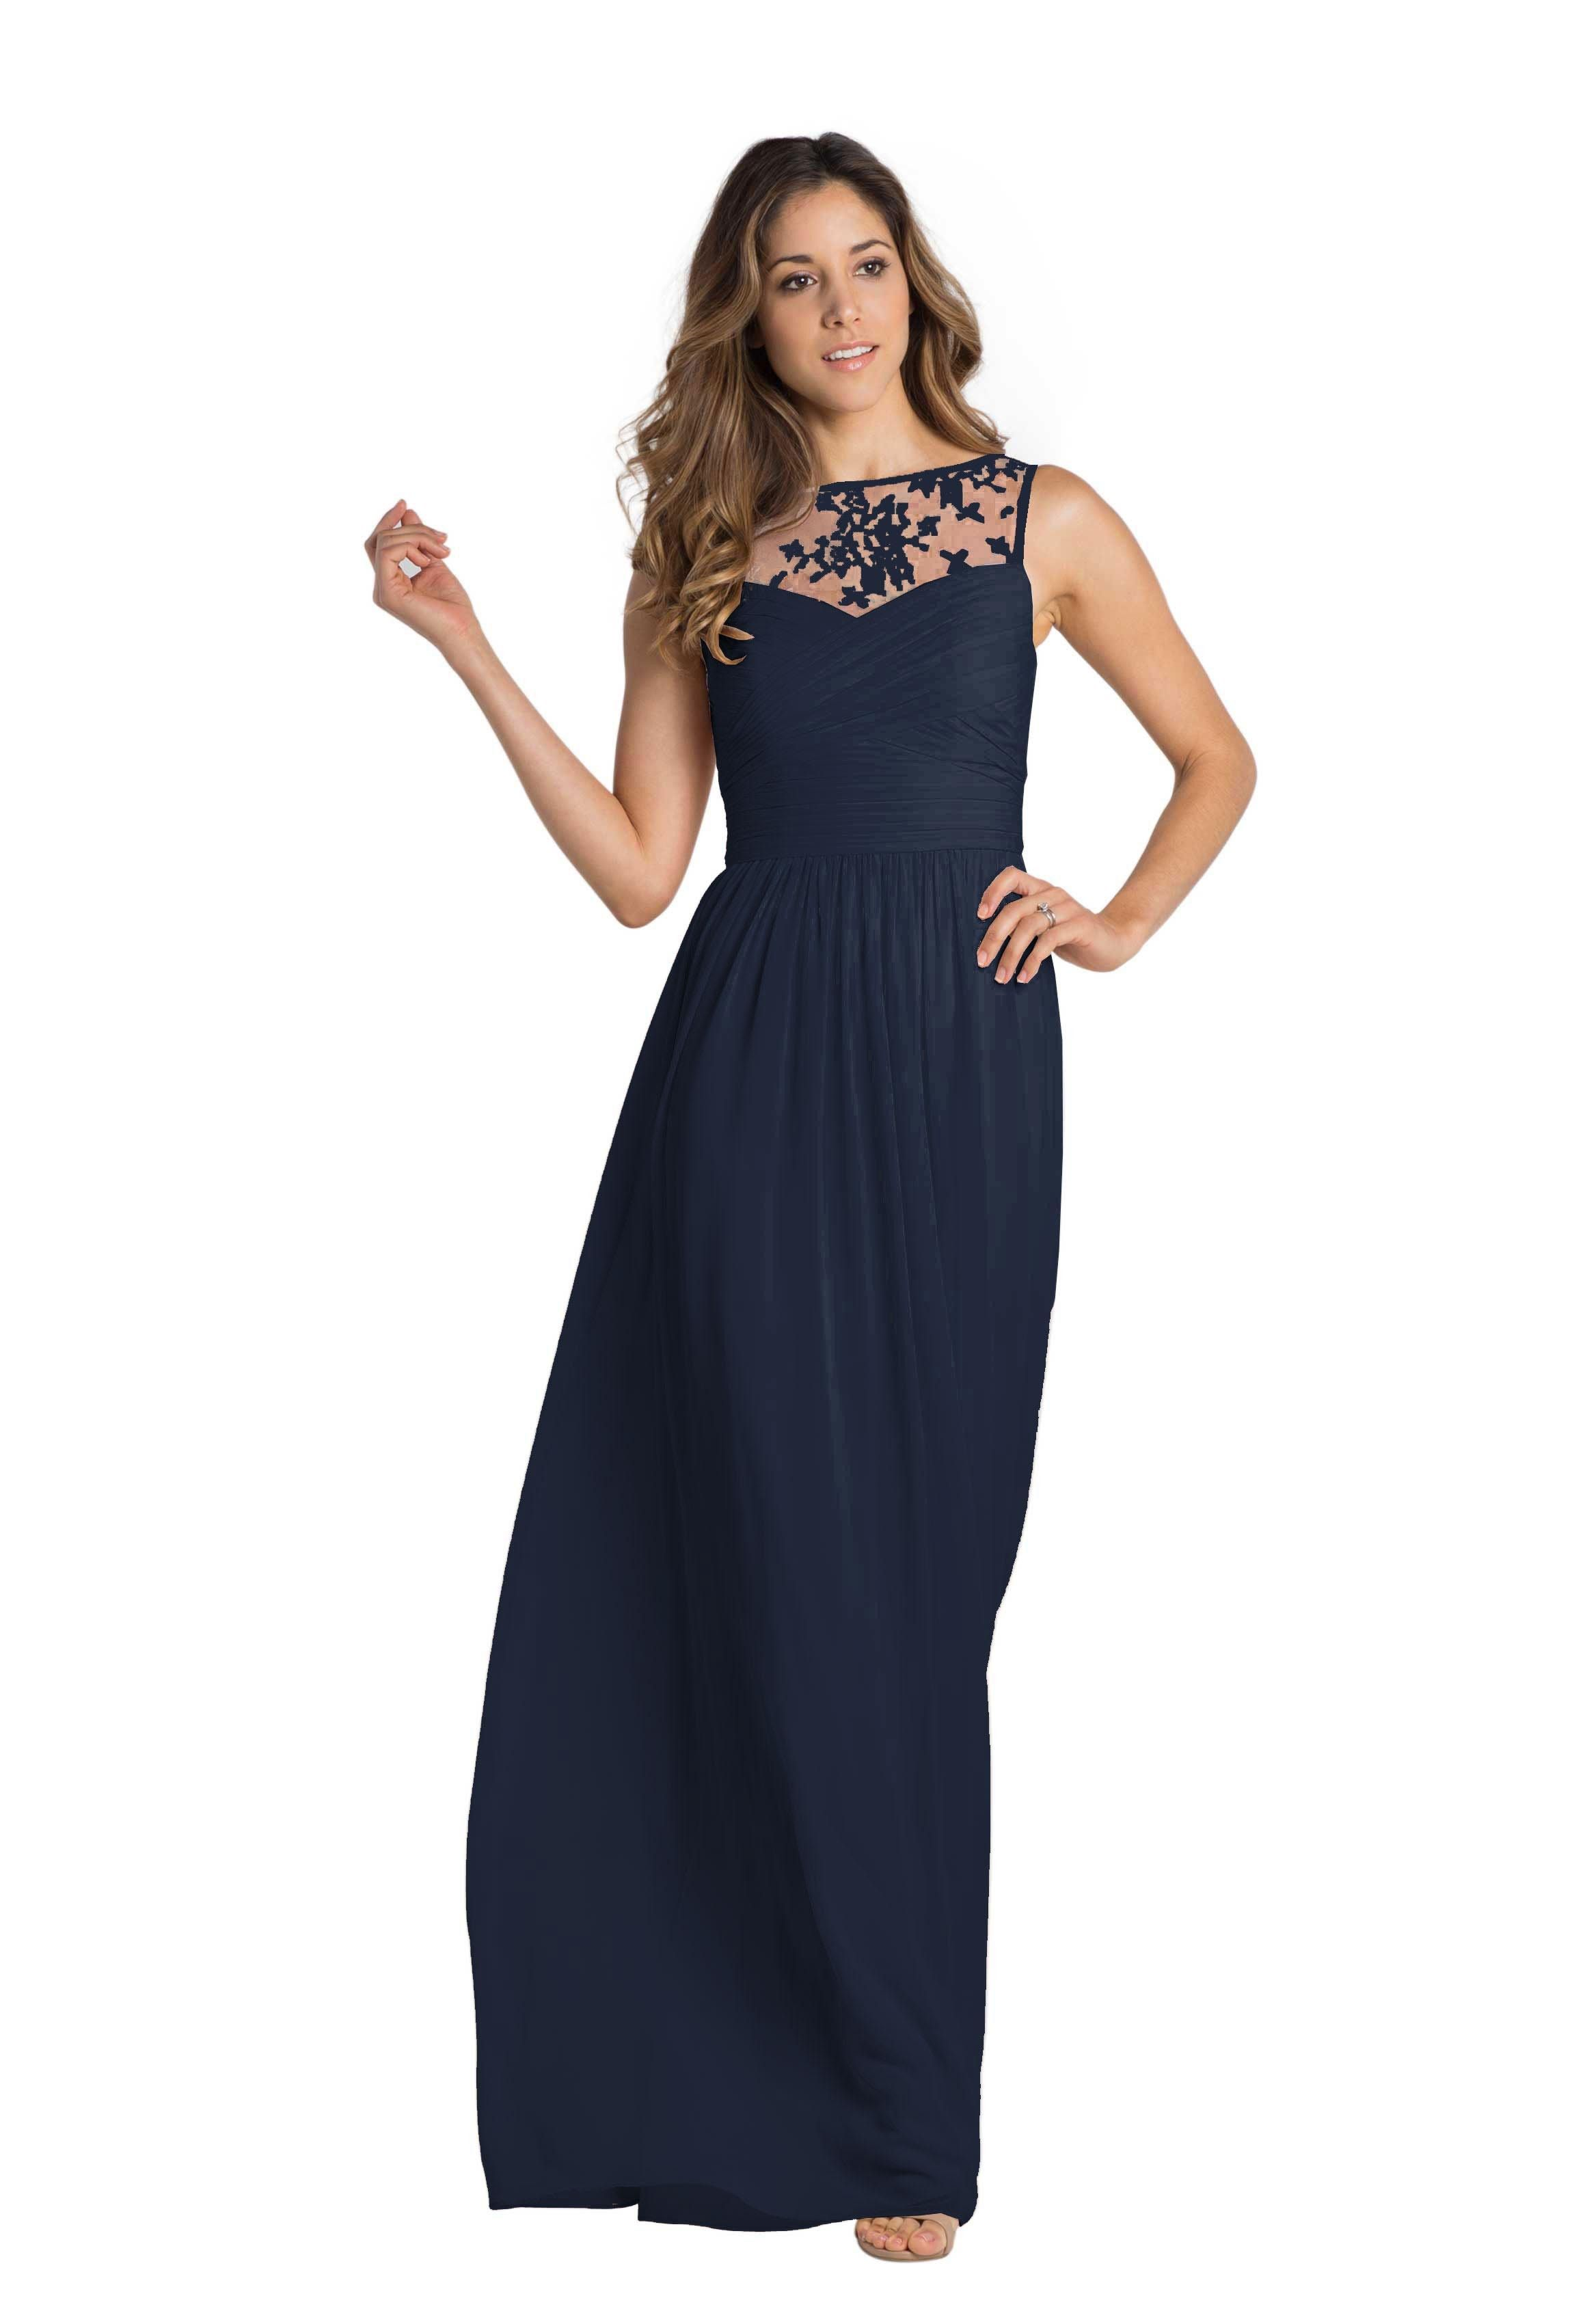 Monique lhuillier riley chiffon bridesmaid dresses and wedding